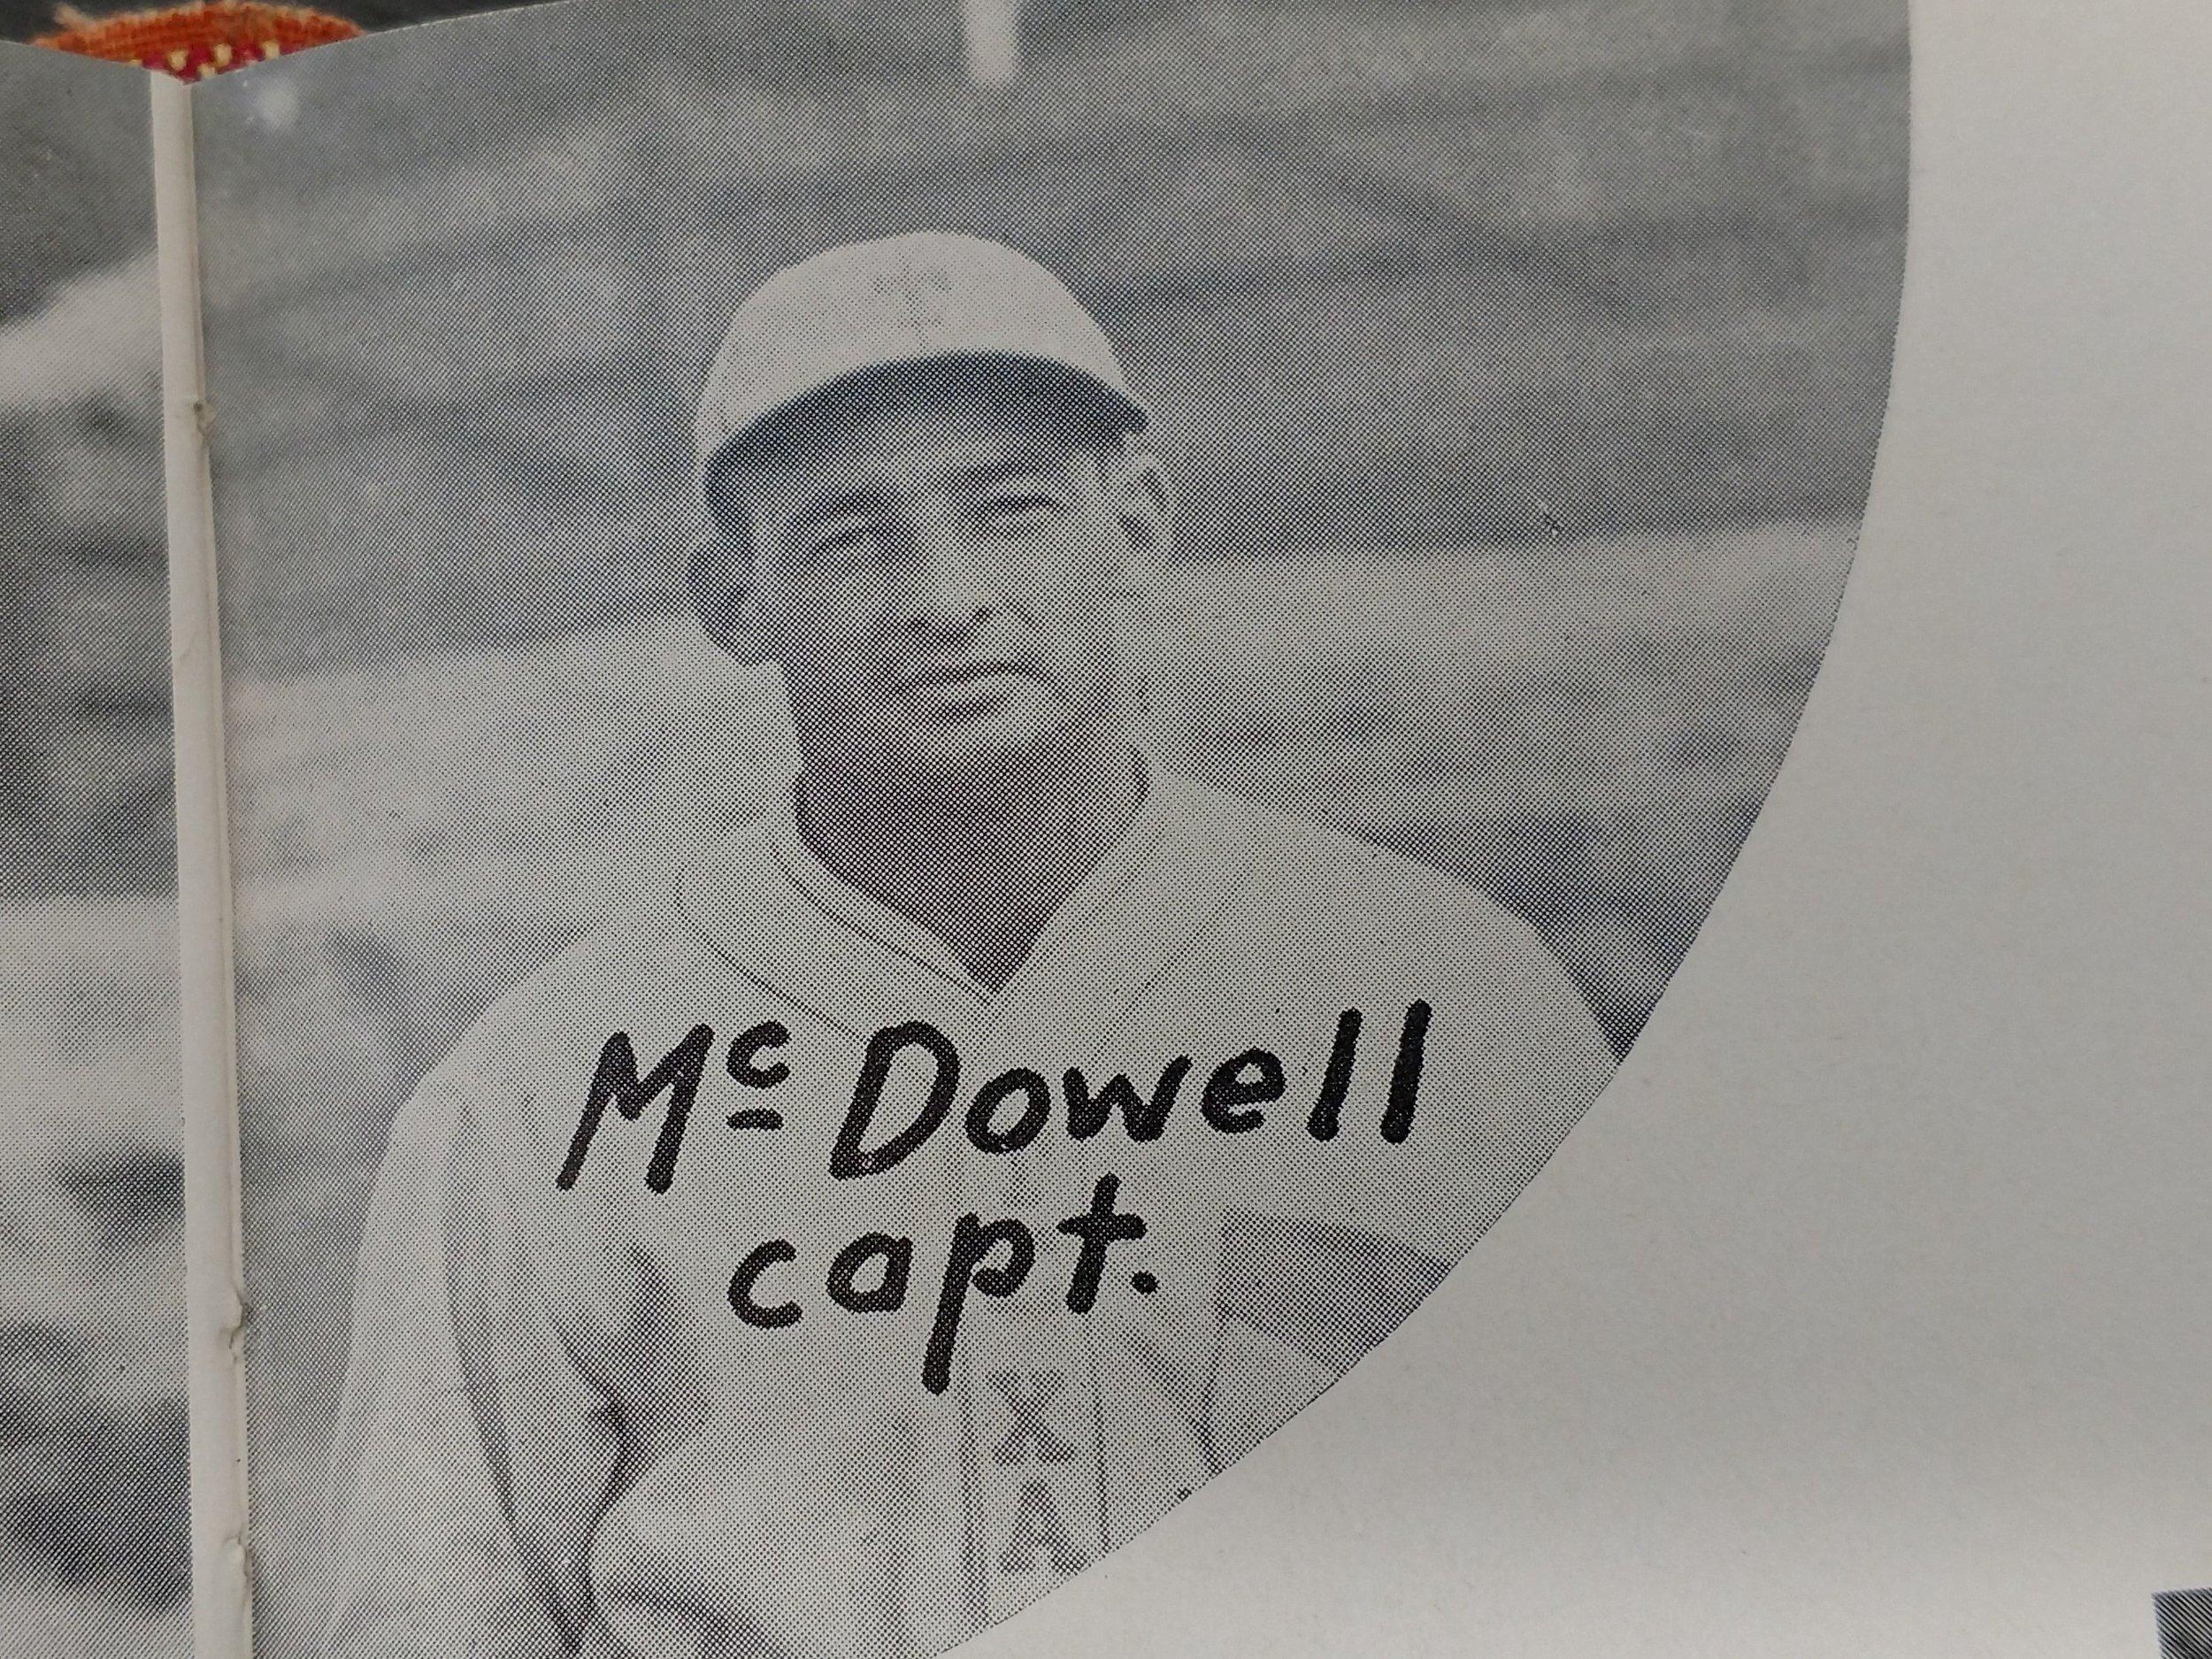 Captain McDowell